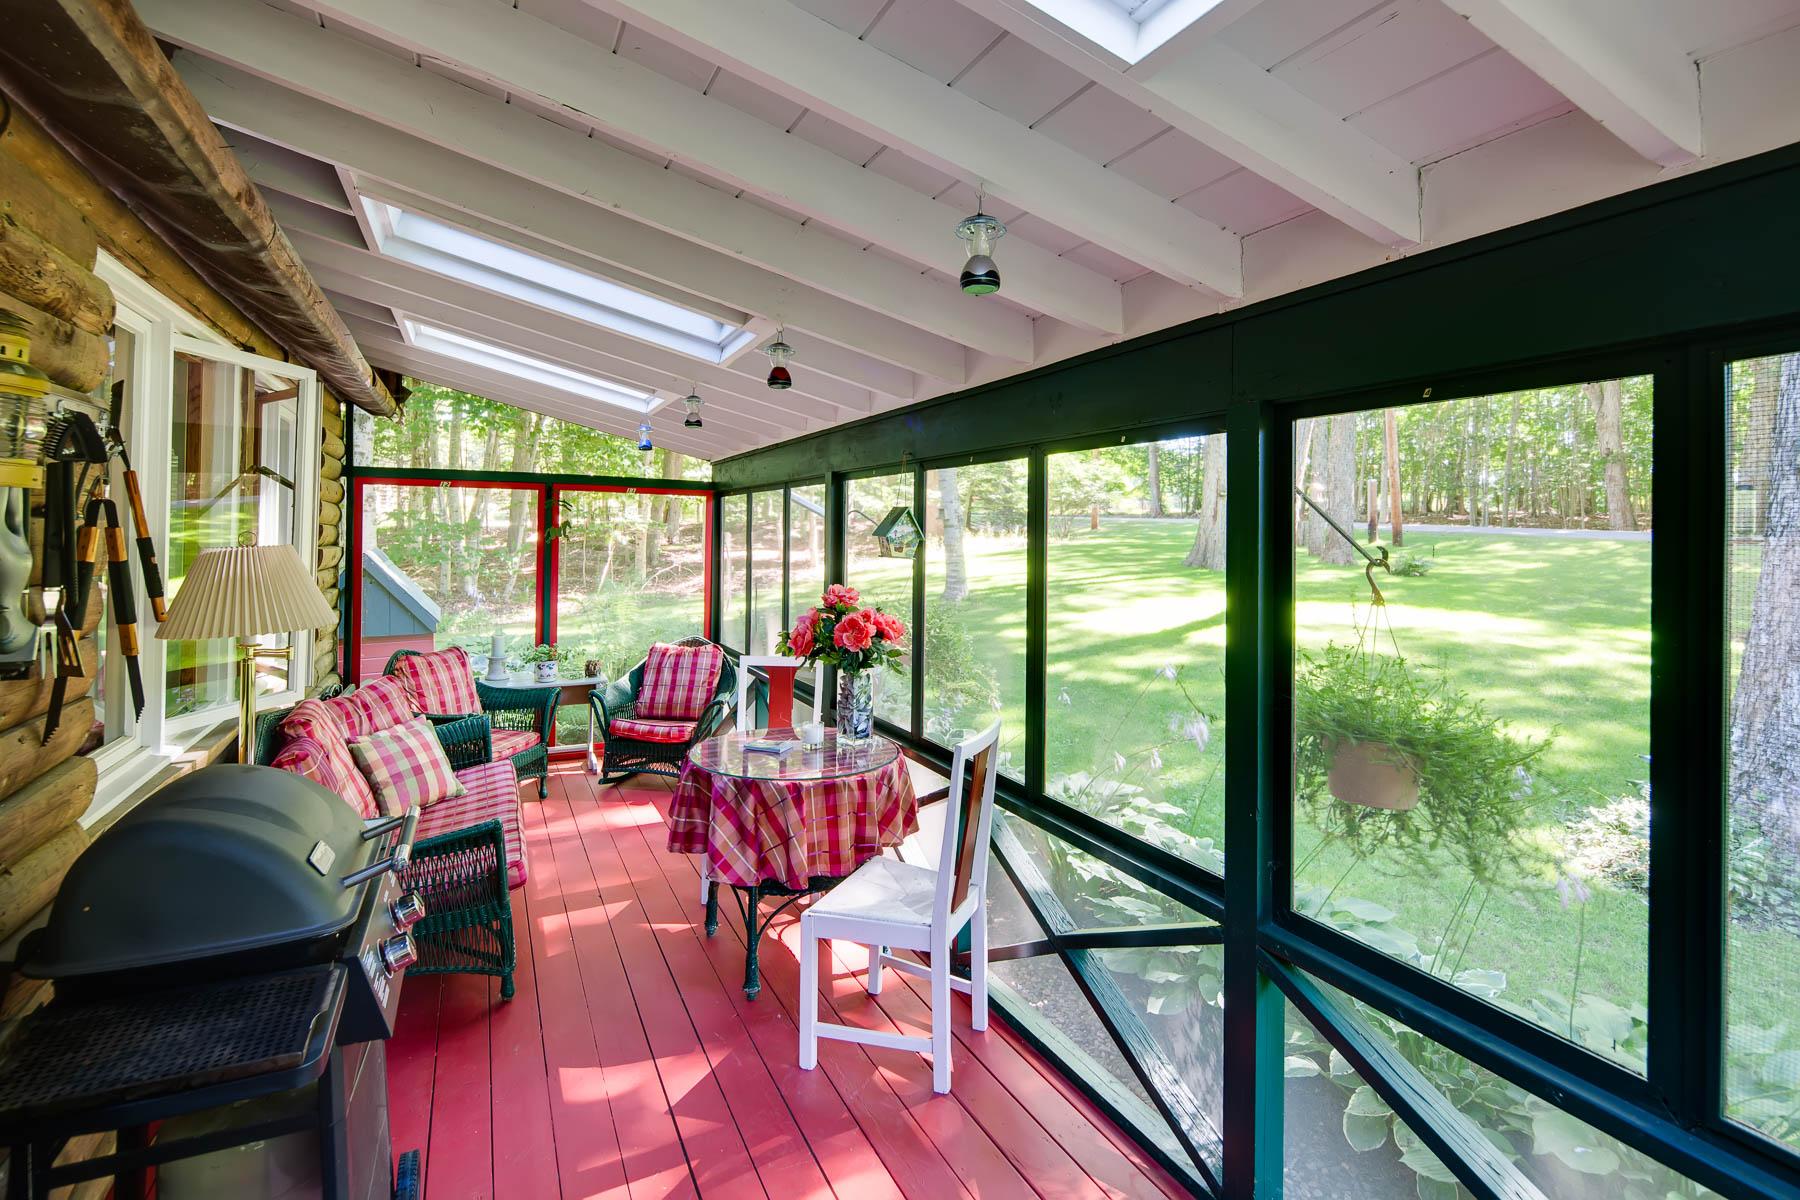 Additional photo for property listing at 1000 Main Road 1000 Main Road Islesboro, Maine 04848 United States